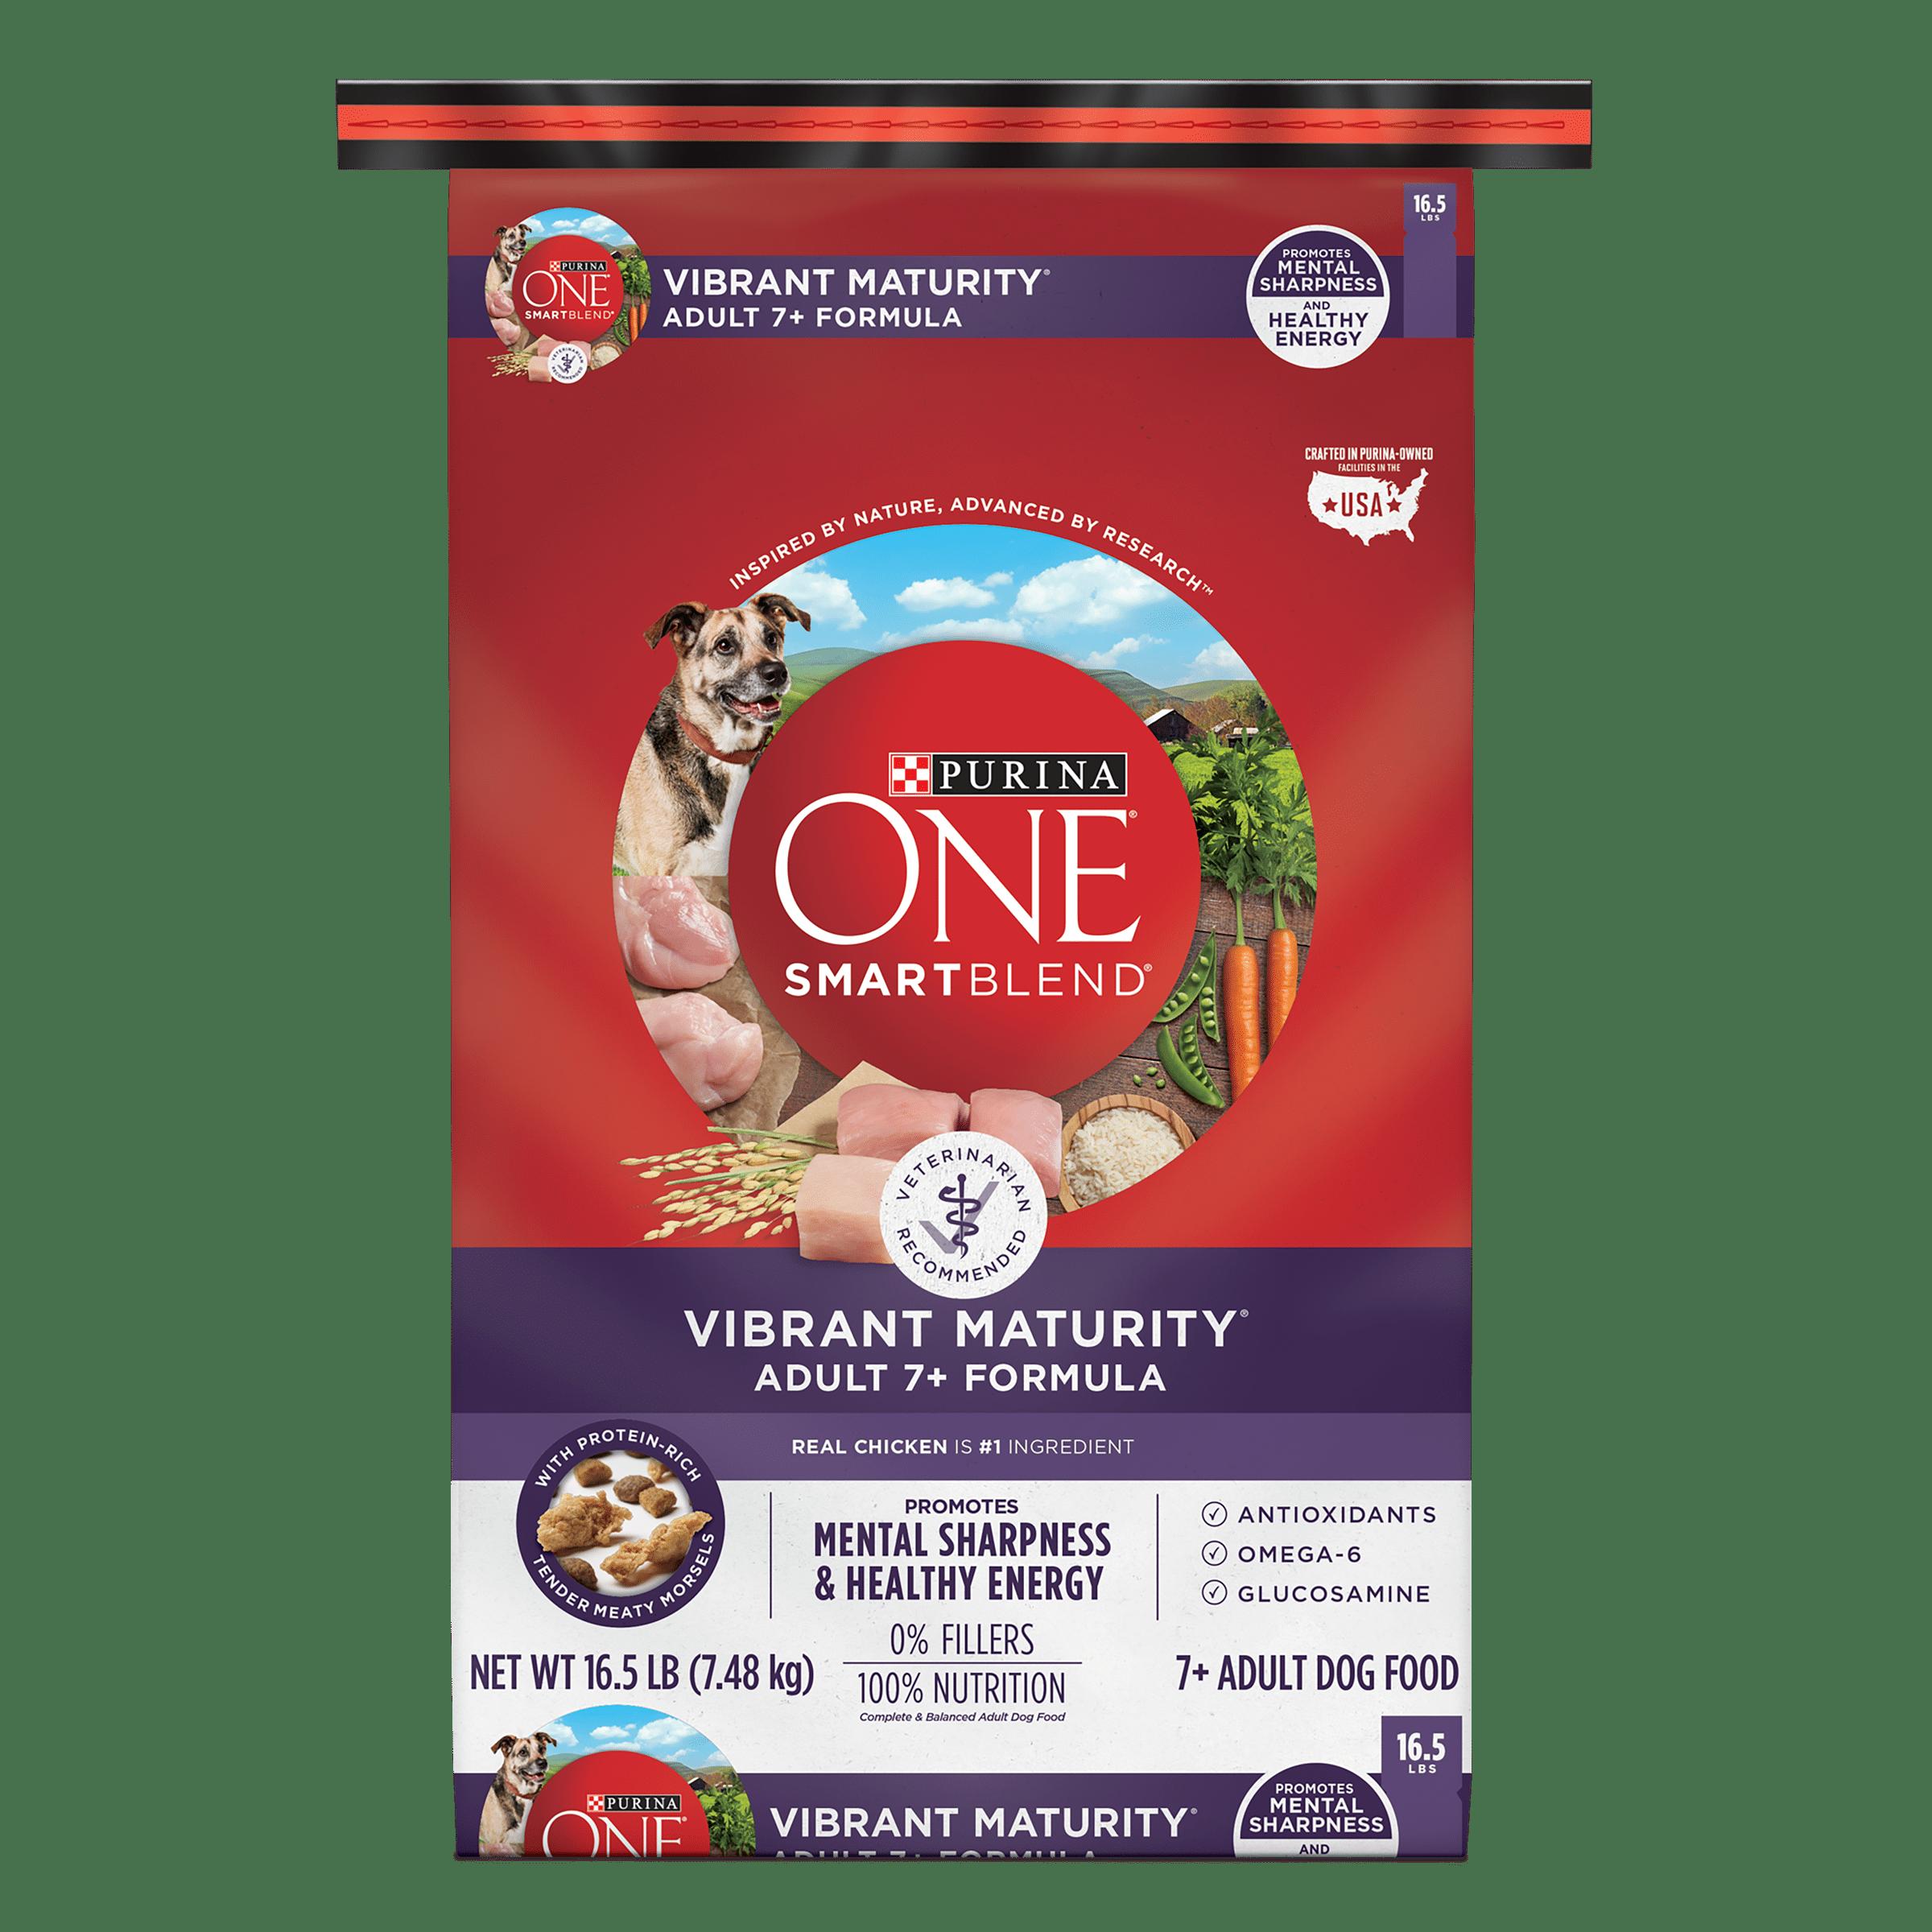 Purina ONE SmartBlend Vibrant Maturity Adult 7+ Formula Dry Dog Food - 16.5 lb. Bag